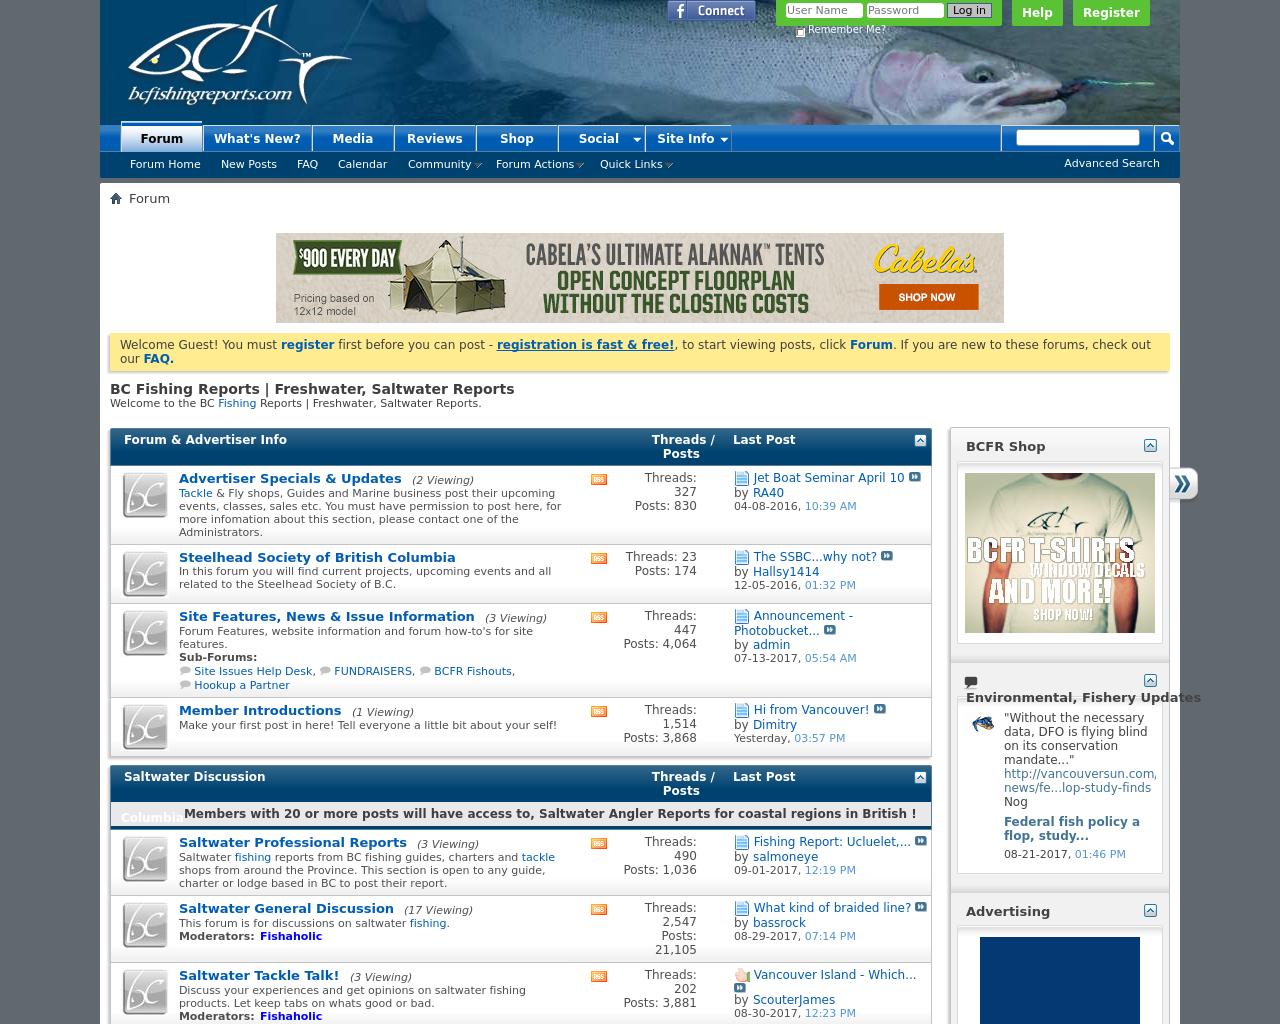 bcfishingreports.com-Advertising-Reviews-Pricing